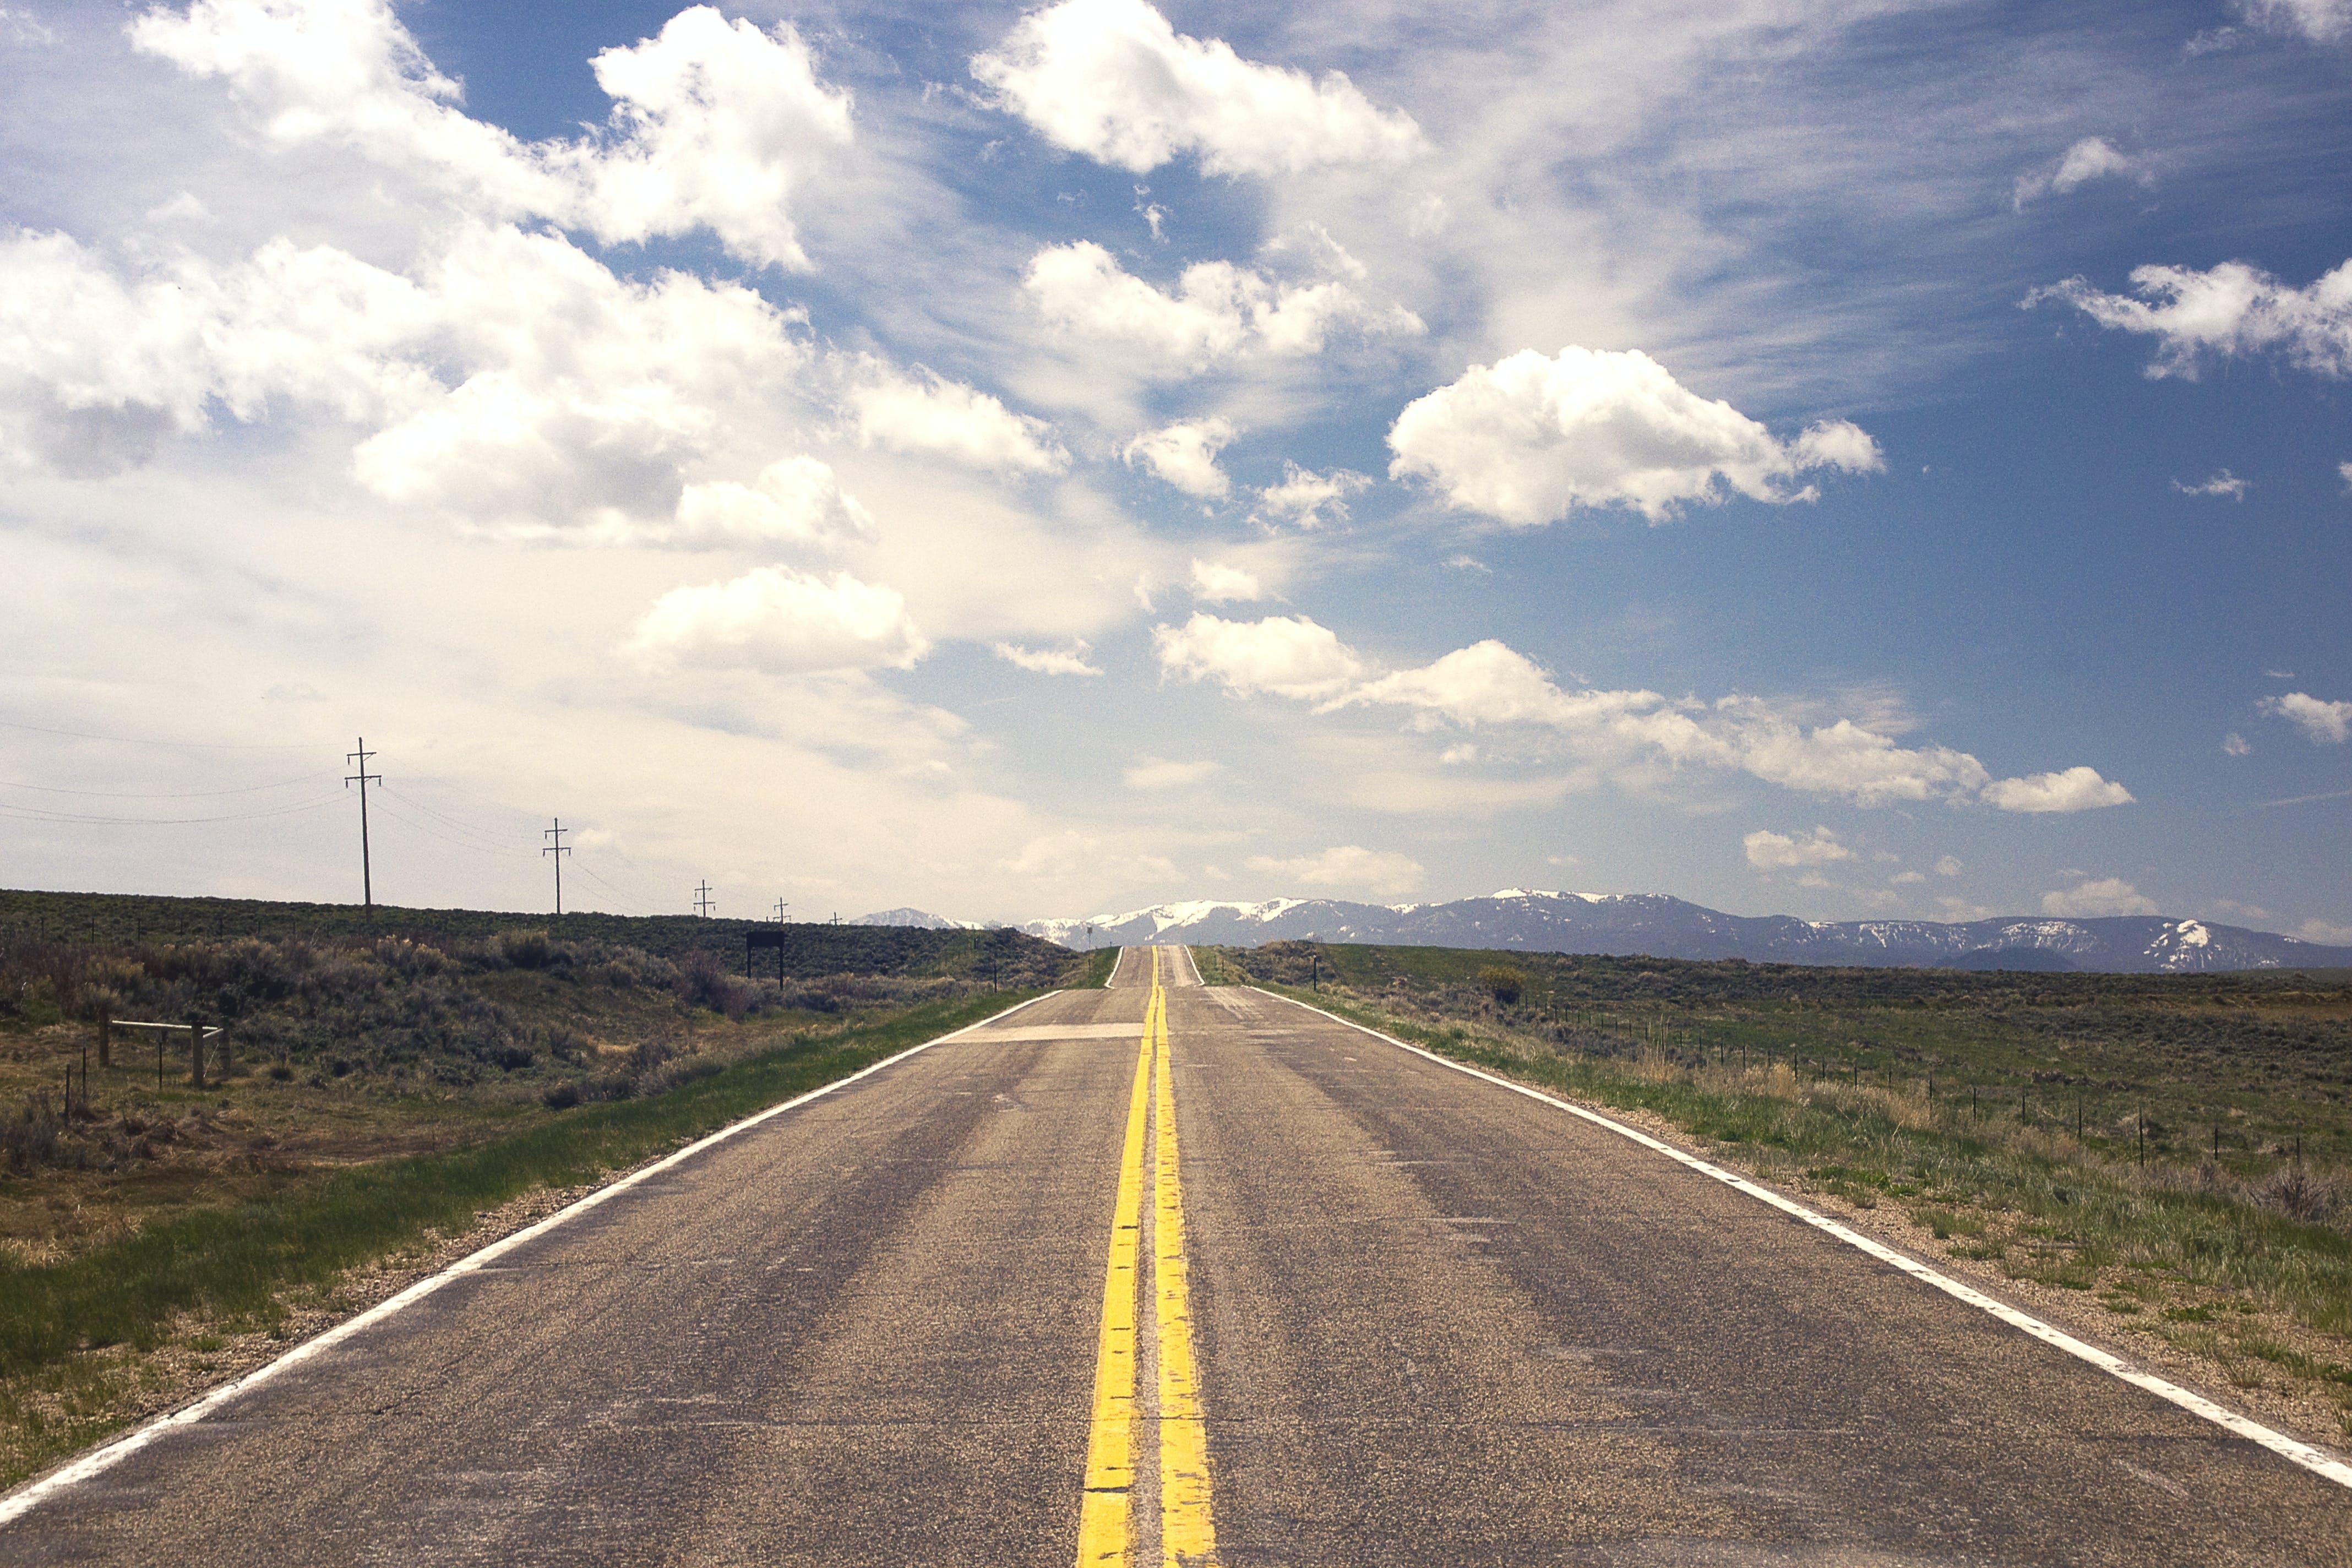 asphalt, aspiration, clouds